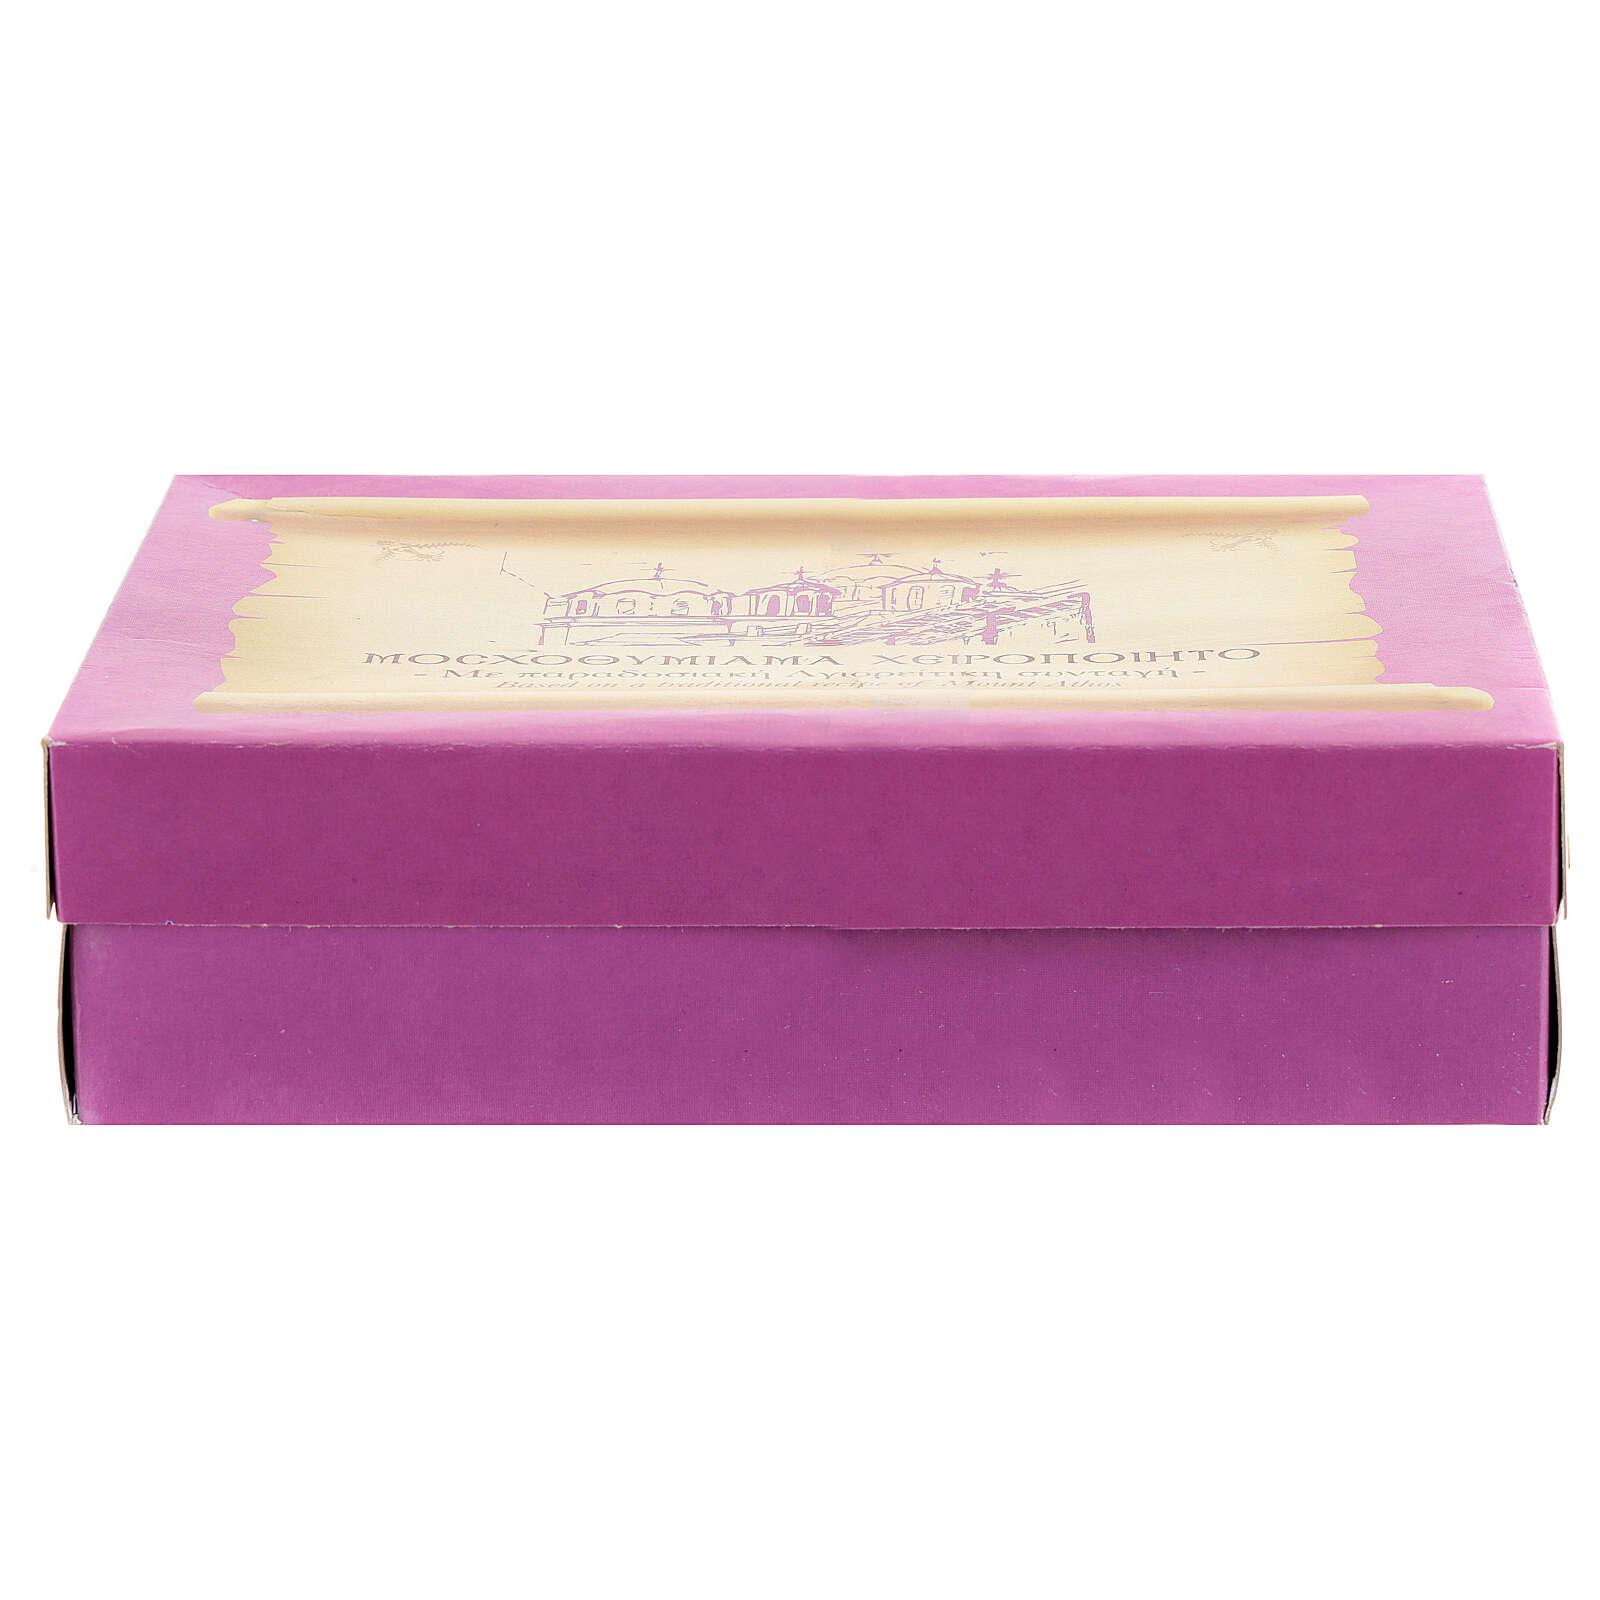 Incenso grego perfumado Violeta 1 kg 3